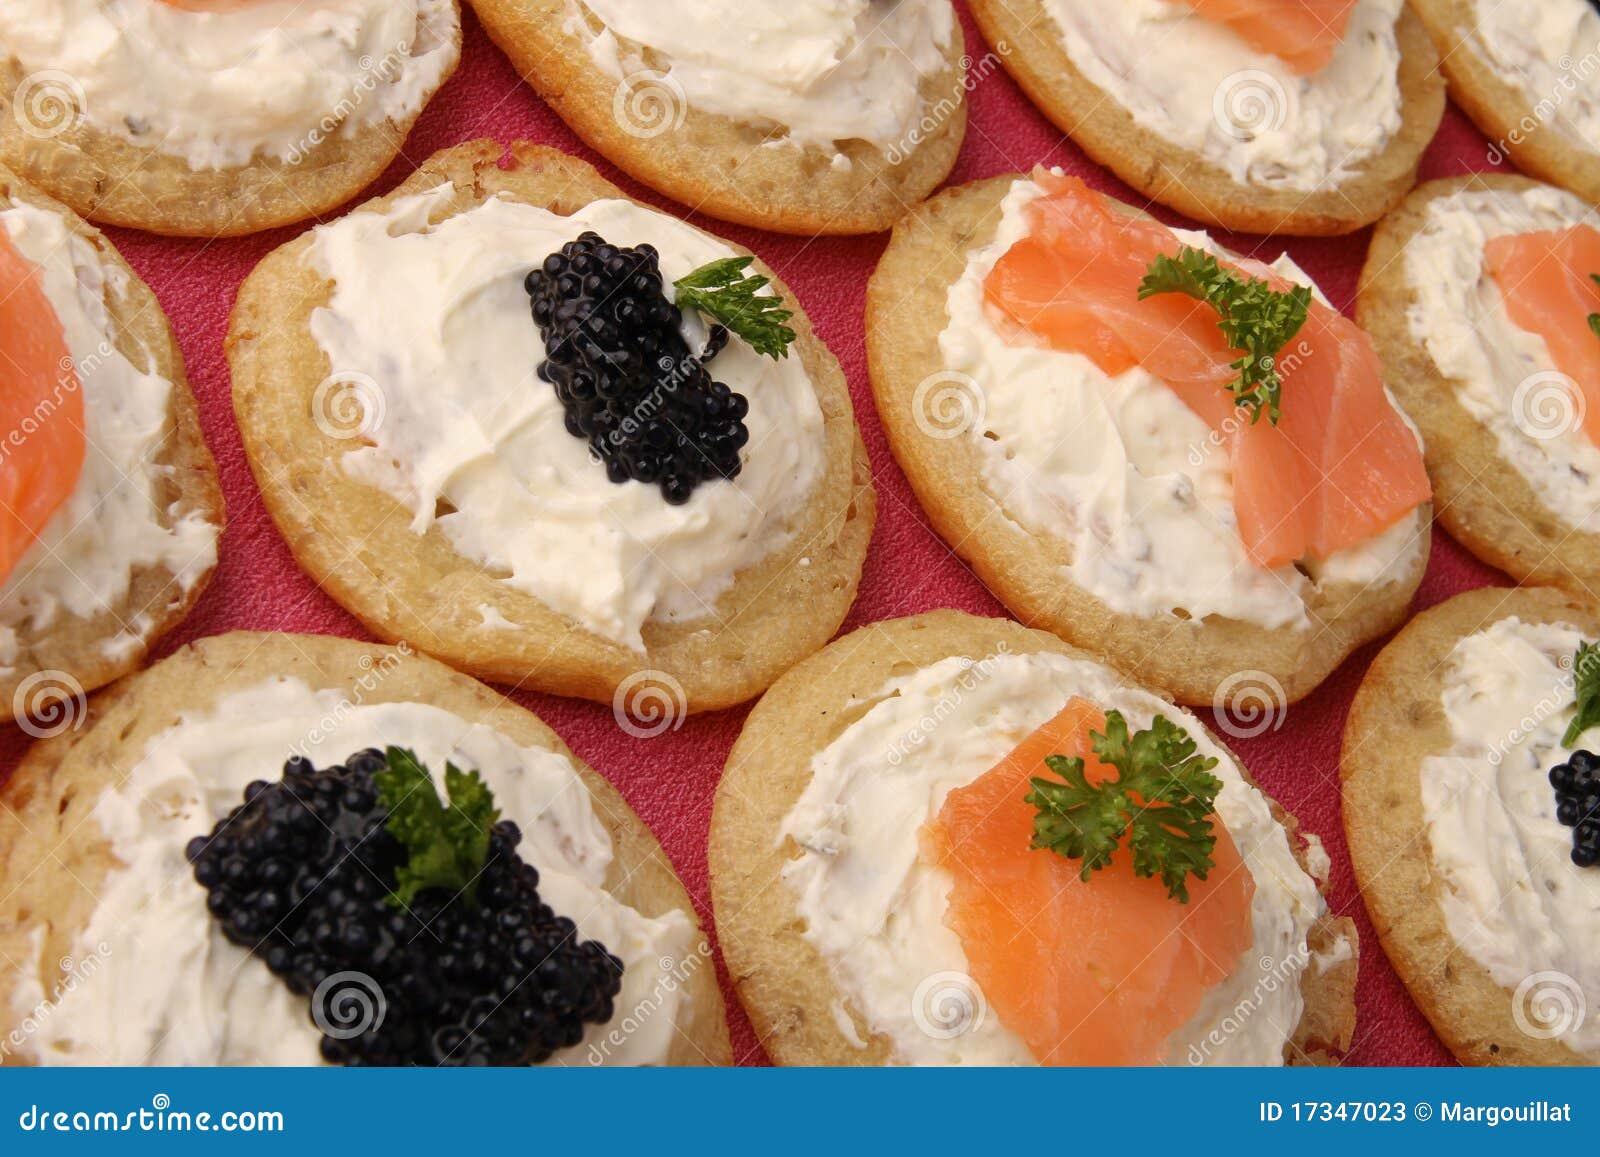 Canape food stock image image of delicious lumpfish for Canape de caviar